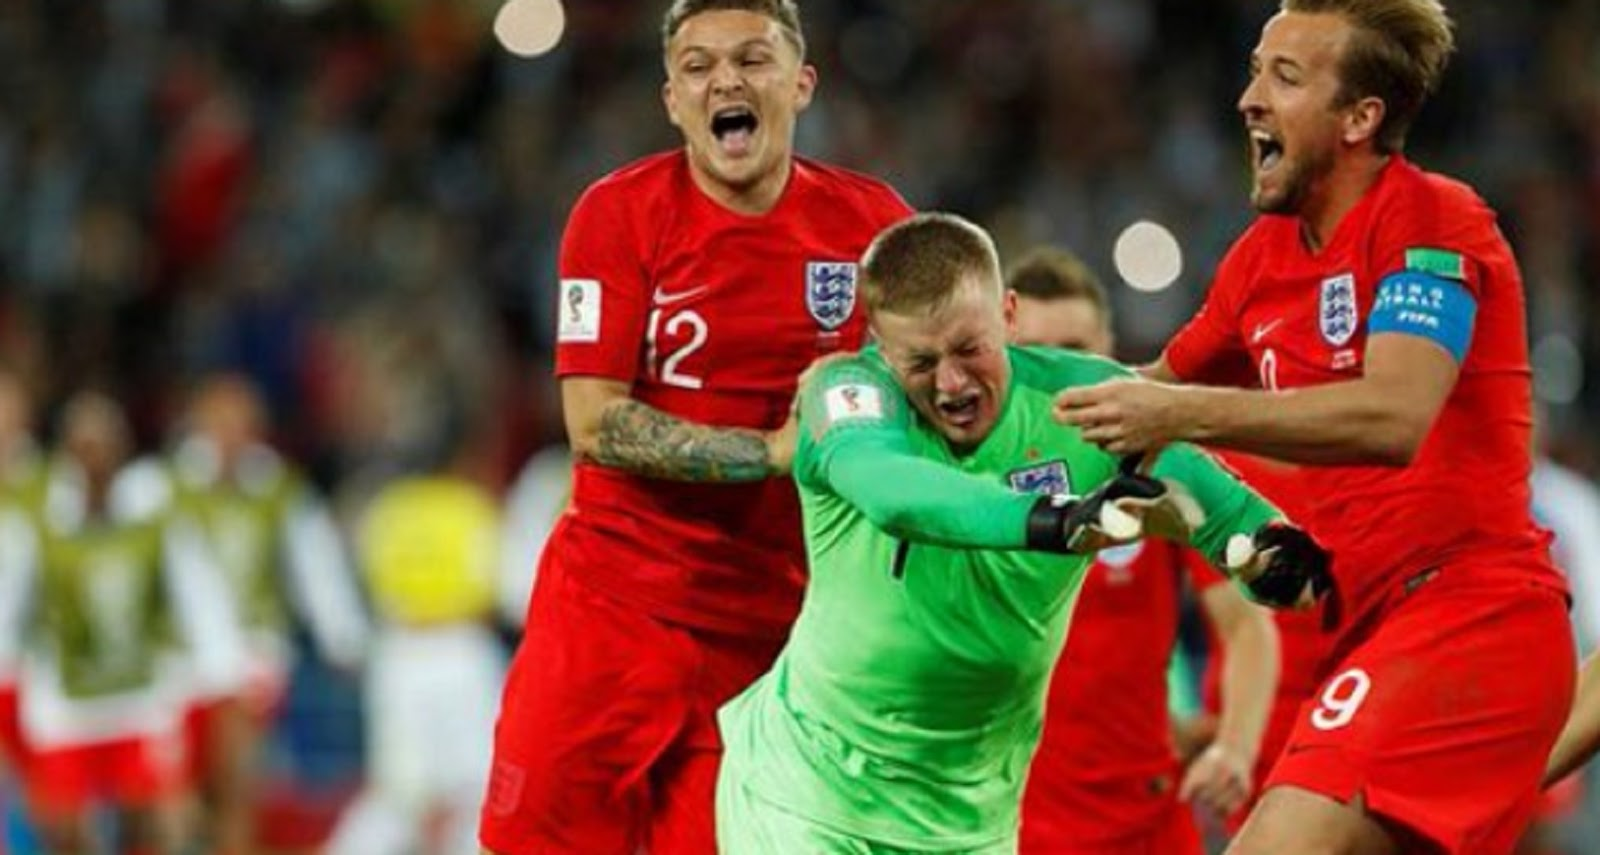 WORLD CUP, ENGLAND 2